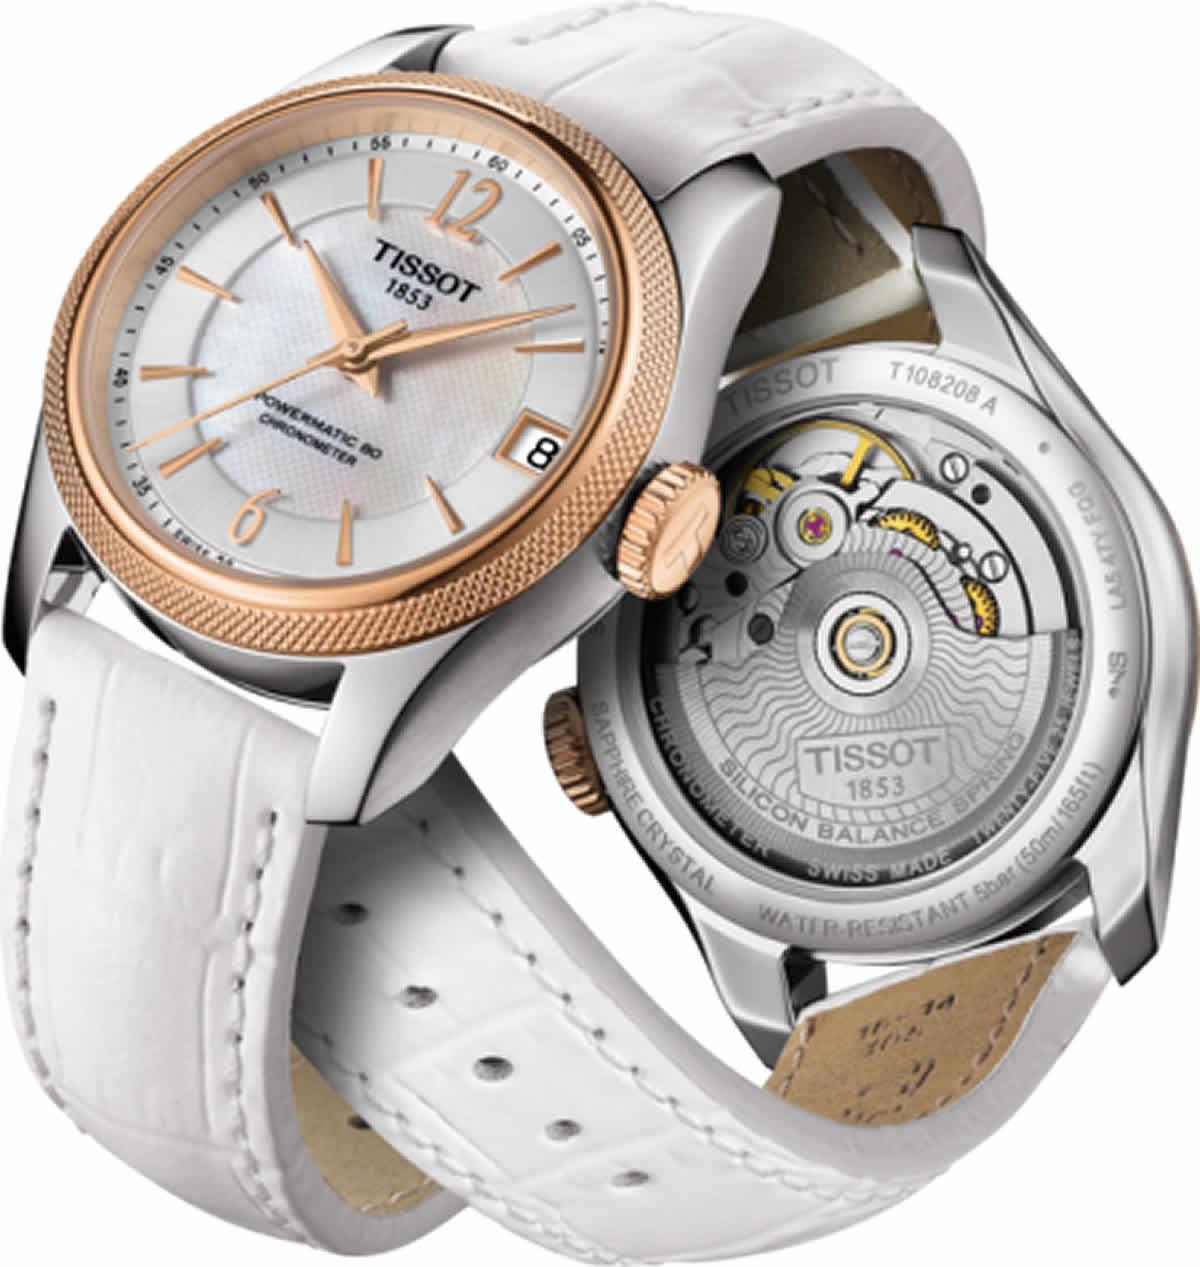 TISSOT(ティソ) Ballade Automatic (バラード オートマティック)腕時計 女性用腕時計